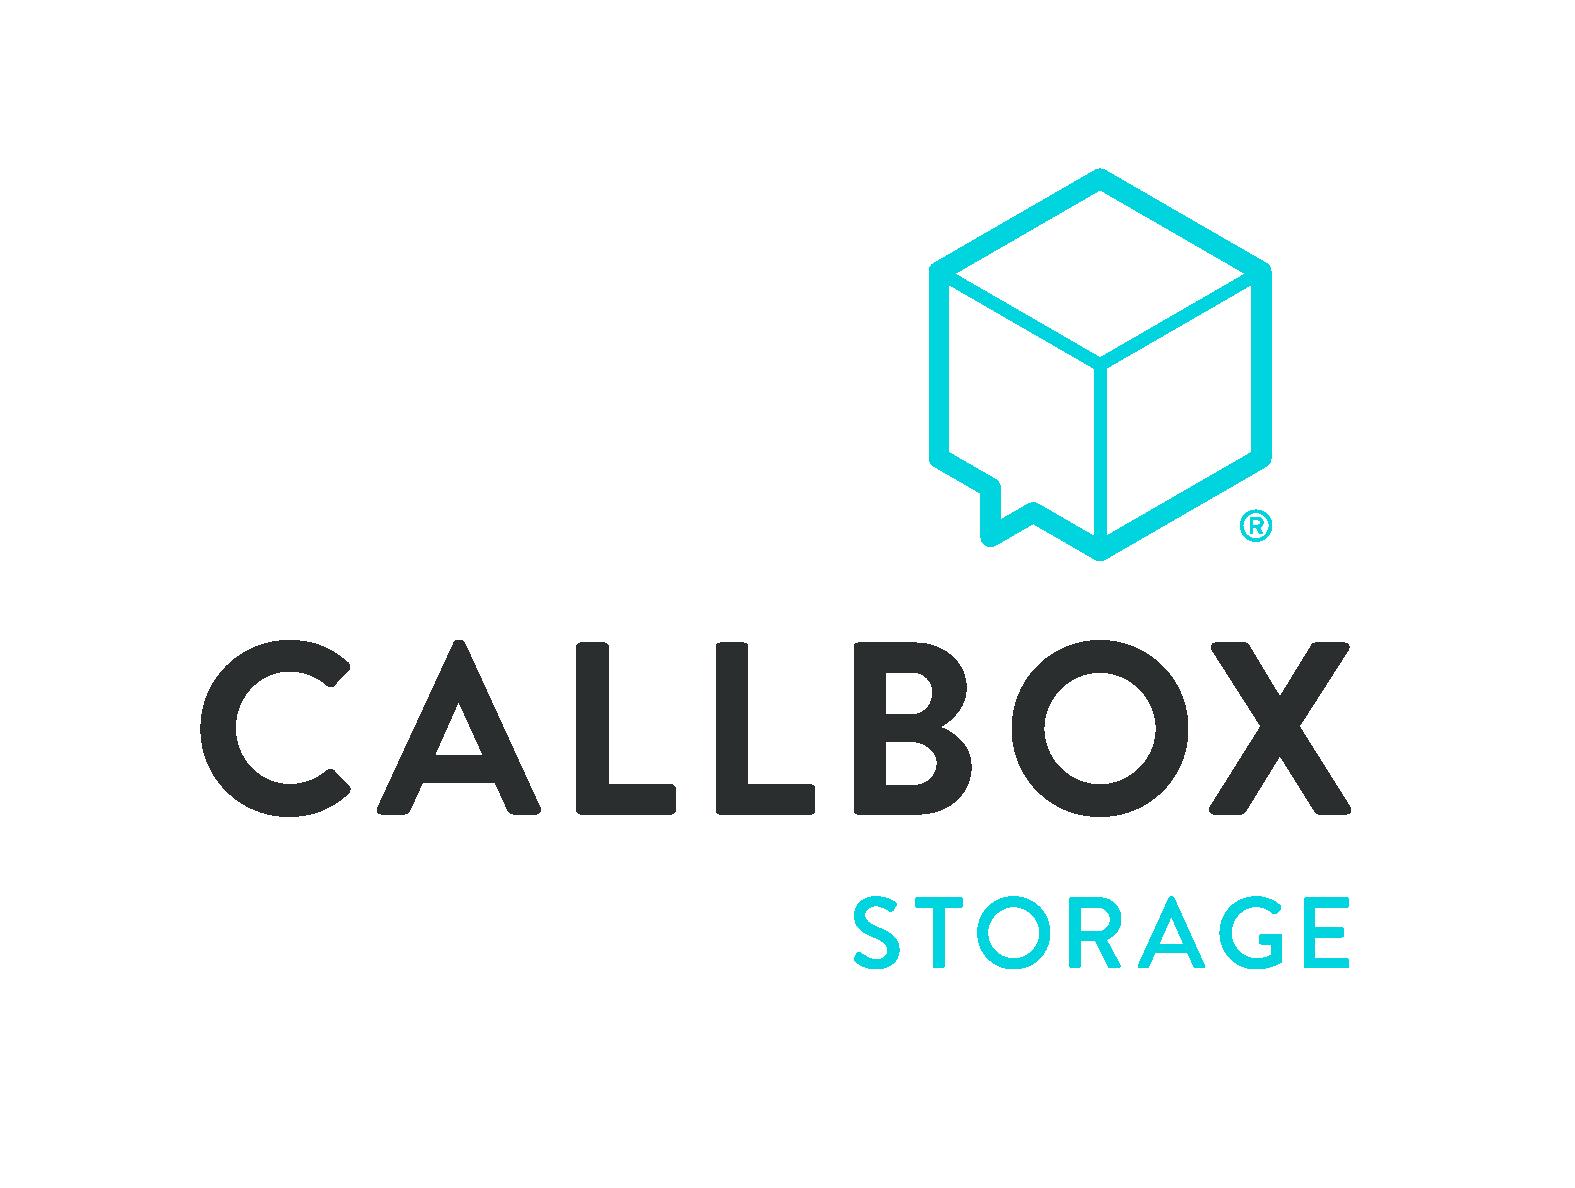 Callbox Storage Corporation